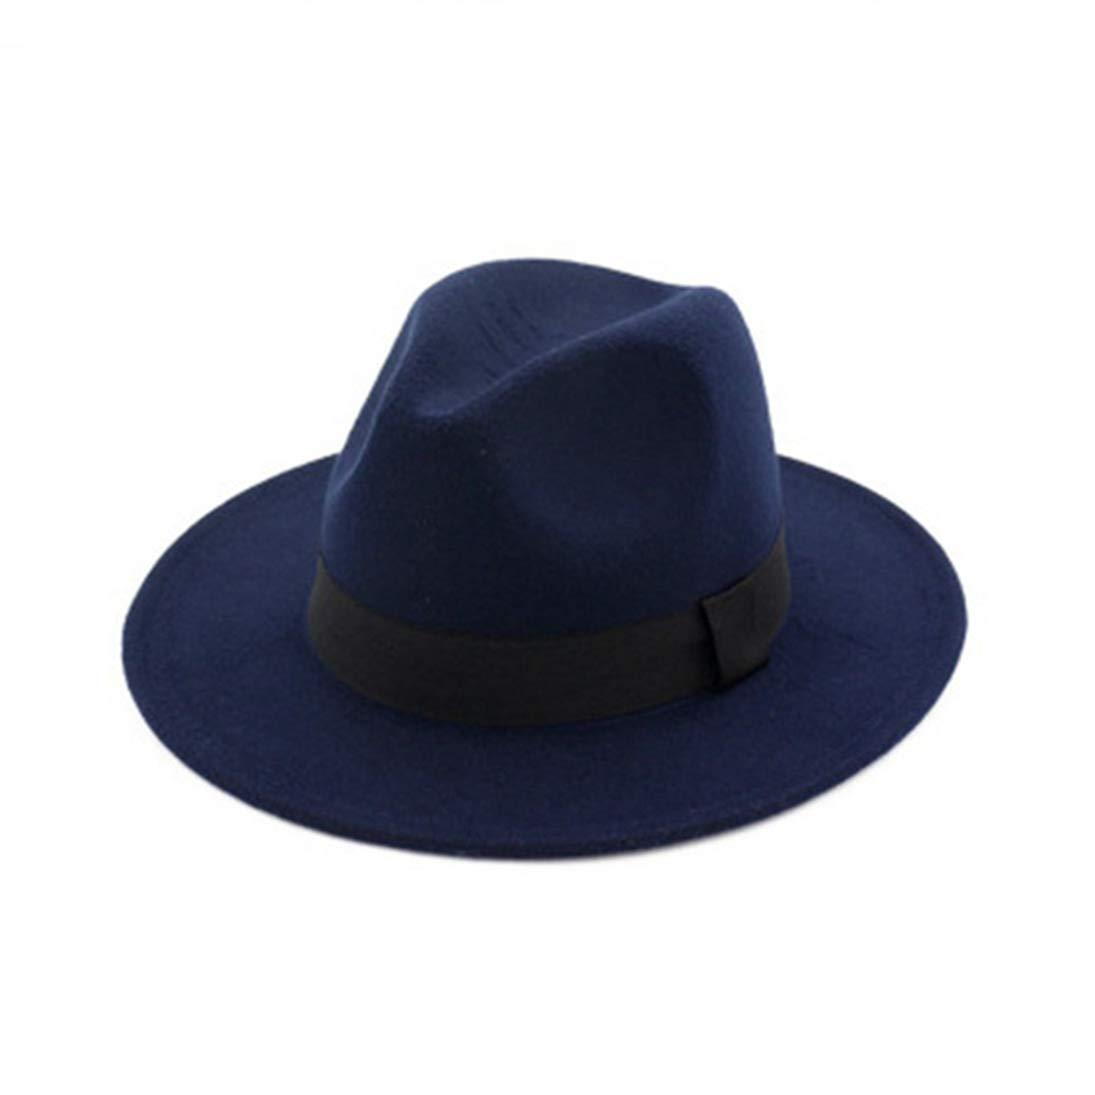 Wool Felt Fedora Hats for Men Women Unisex Classic Flat Wide Brim Cotton Trilby Jazz Hat with Black Band